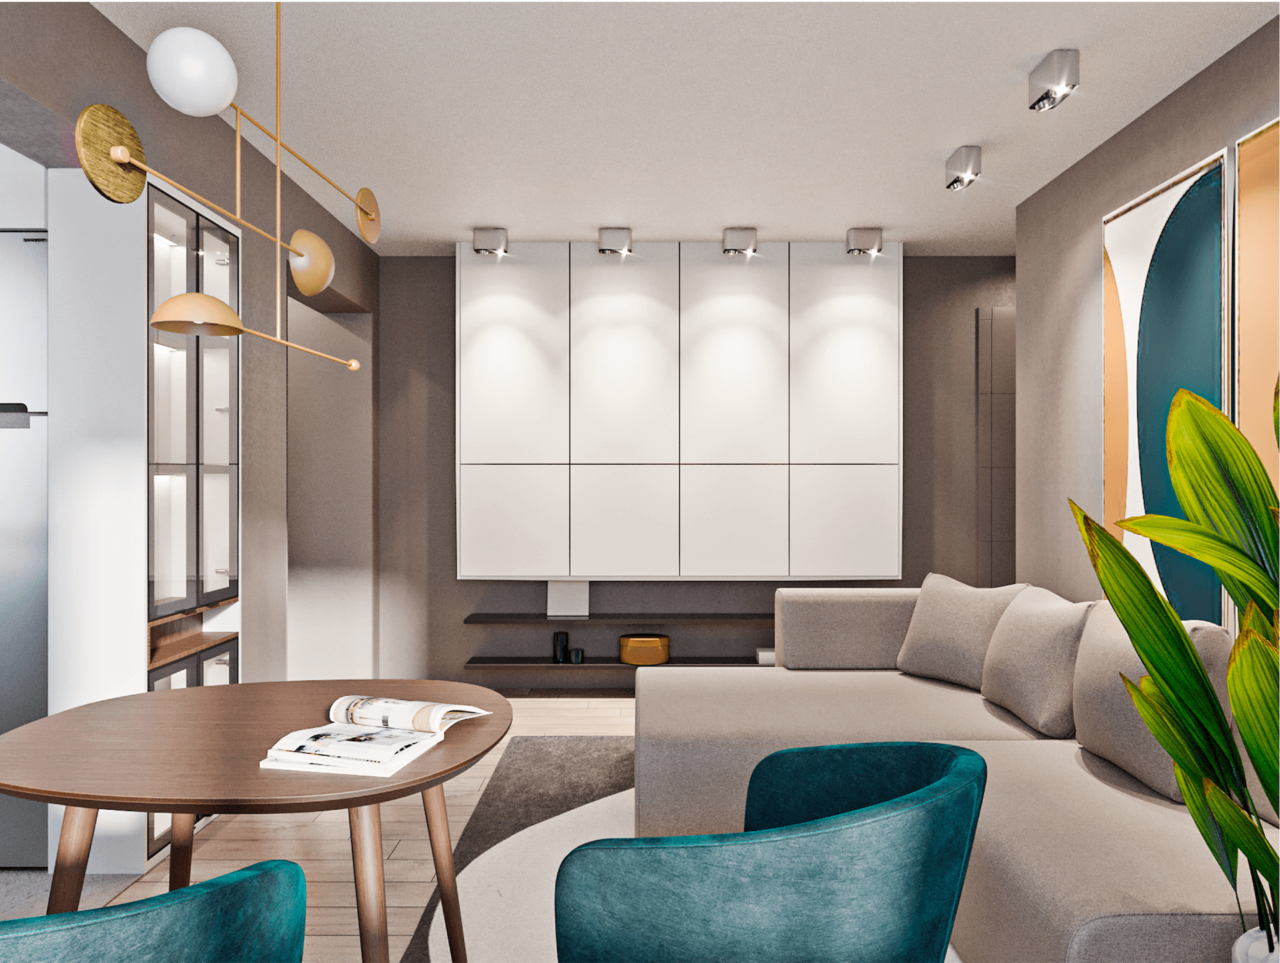 Дизайн проект двухкомнатной квартиры, бирюзовій акцент, Киев | фото 15